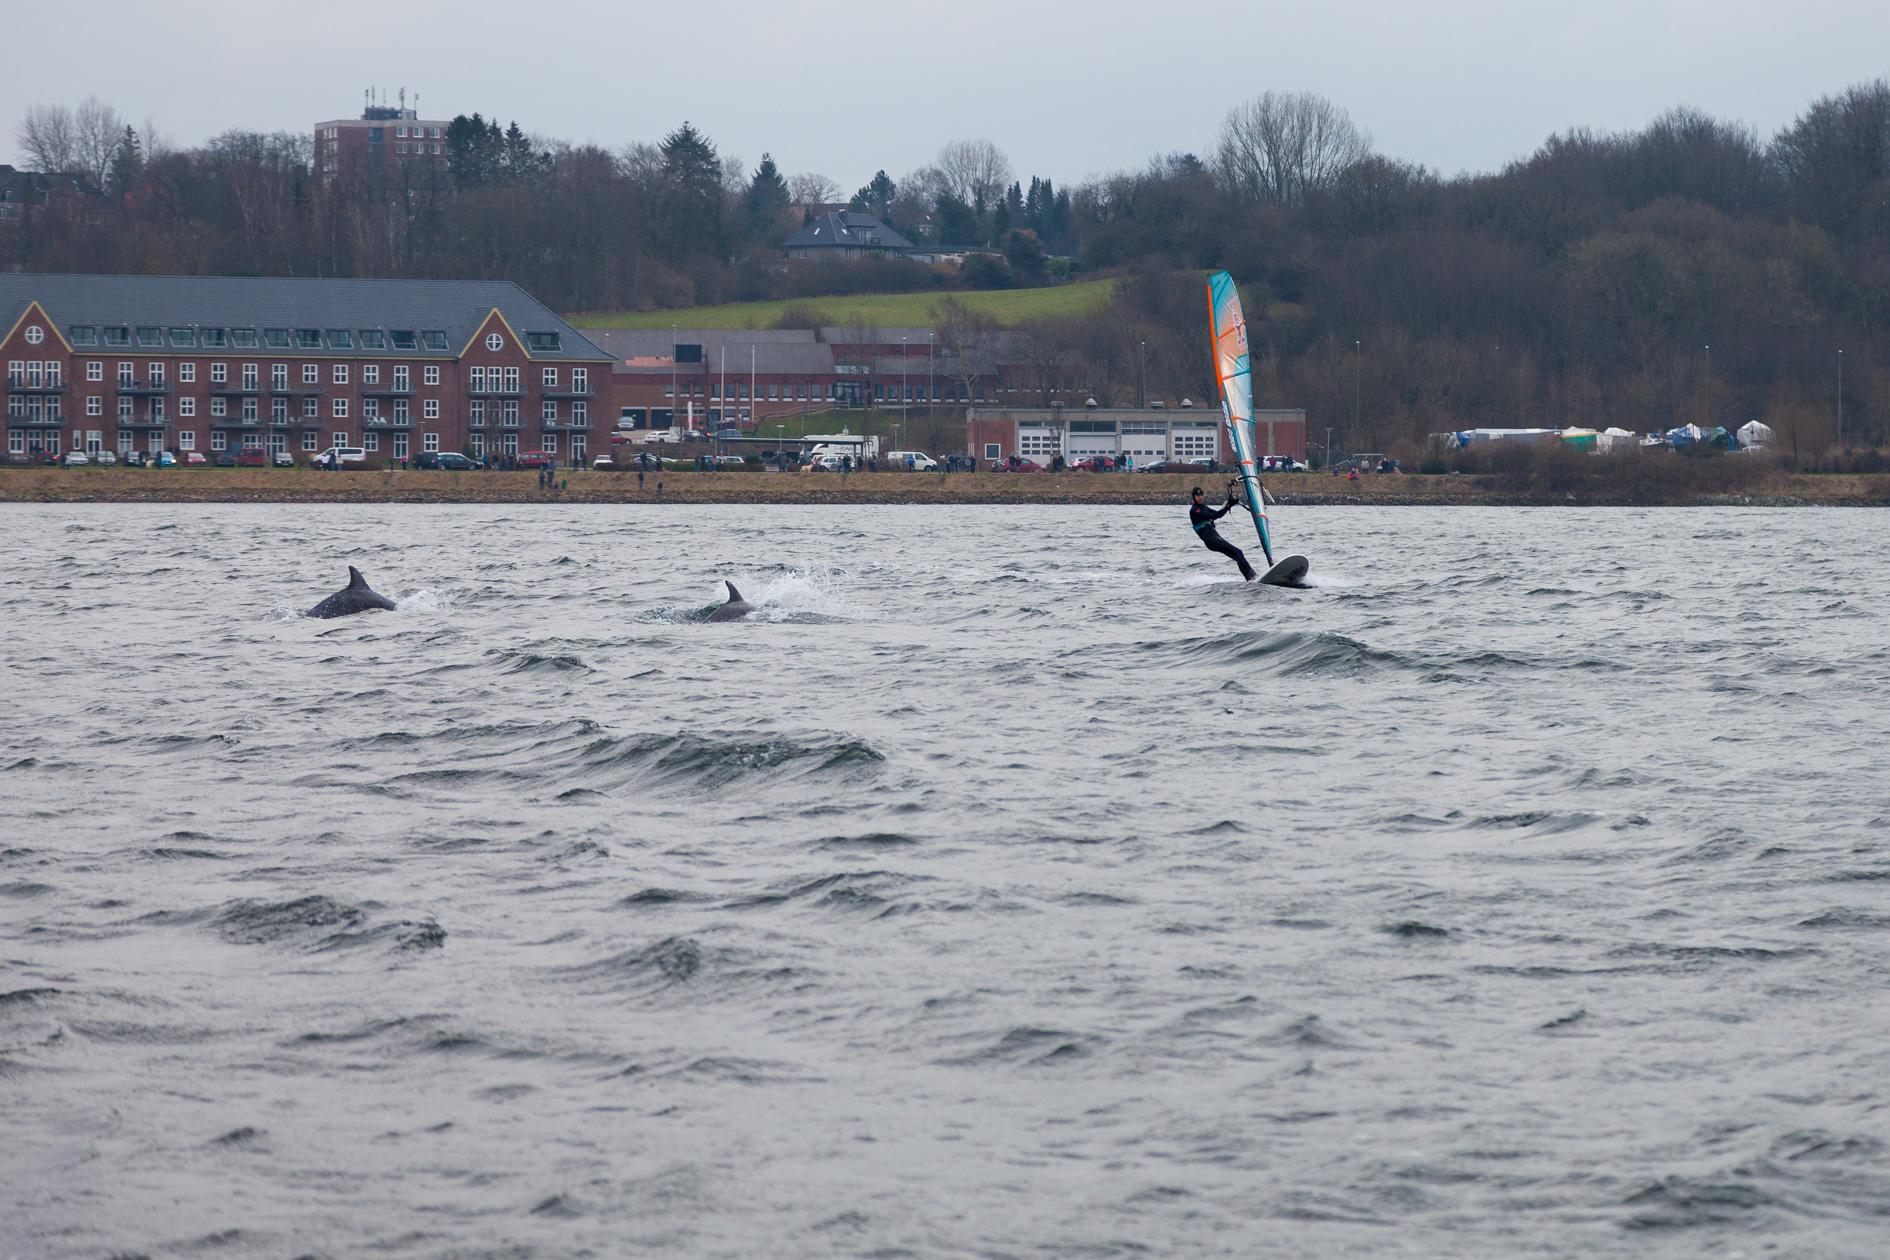 Delfine in der Flensburger Förde